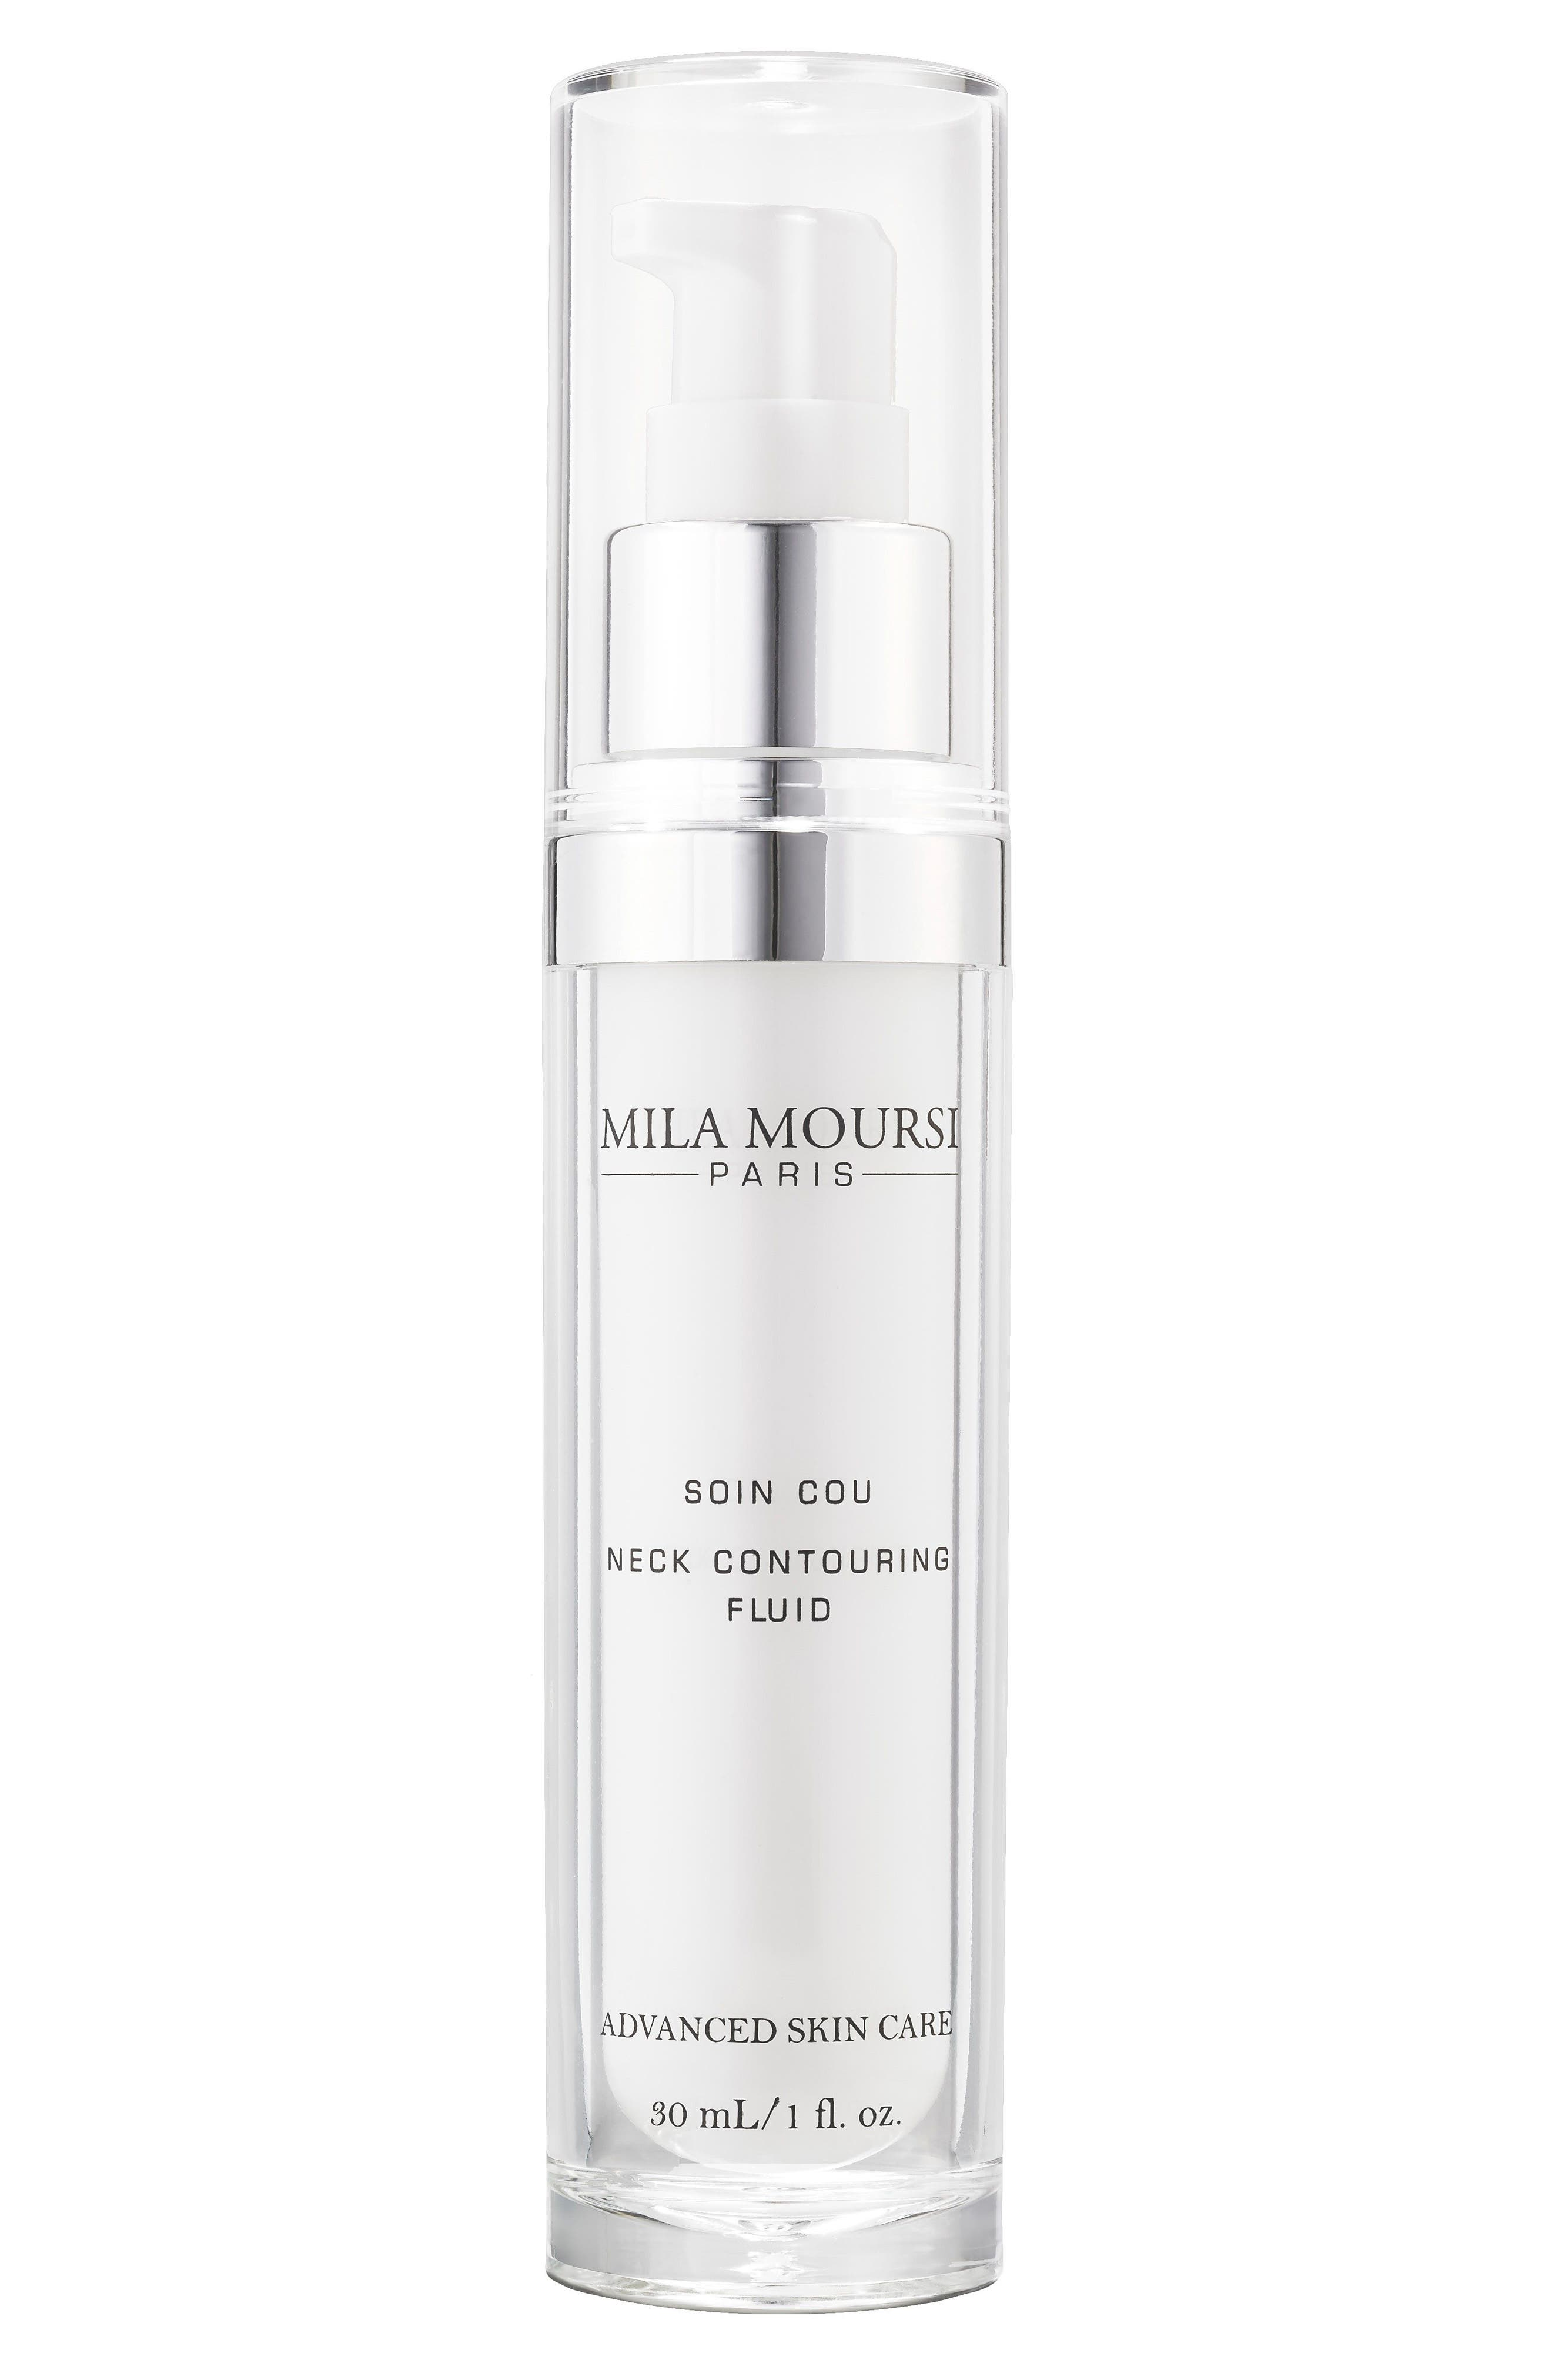 SPACE.NK.apothecary Mila Moursi Neck Contouring Fluid